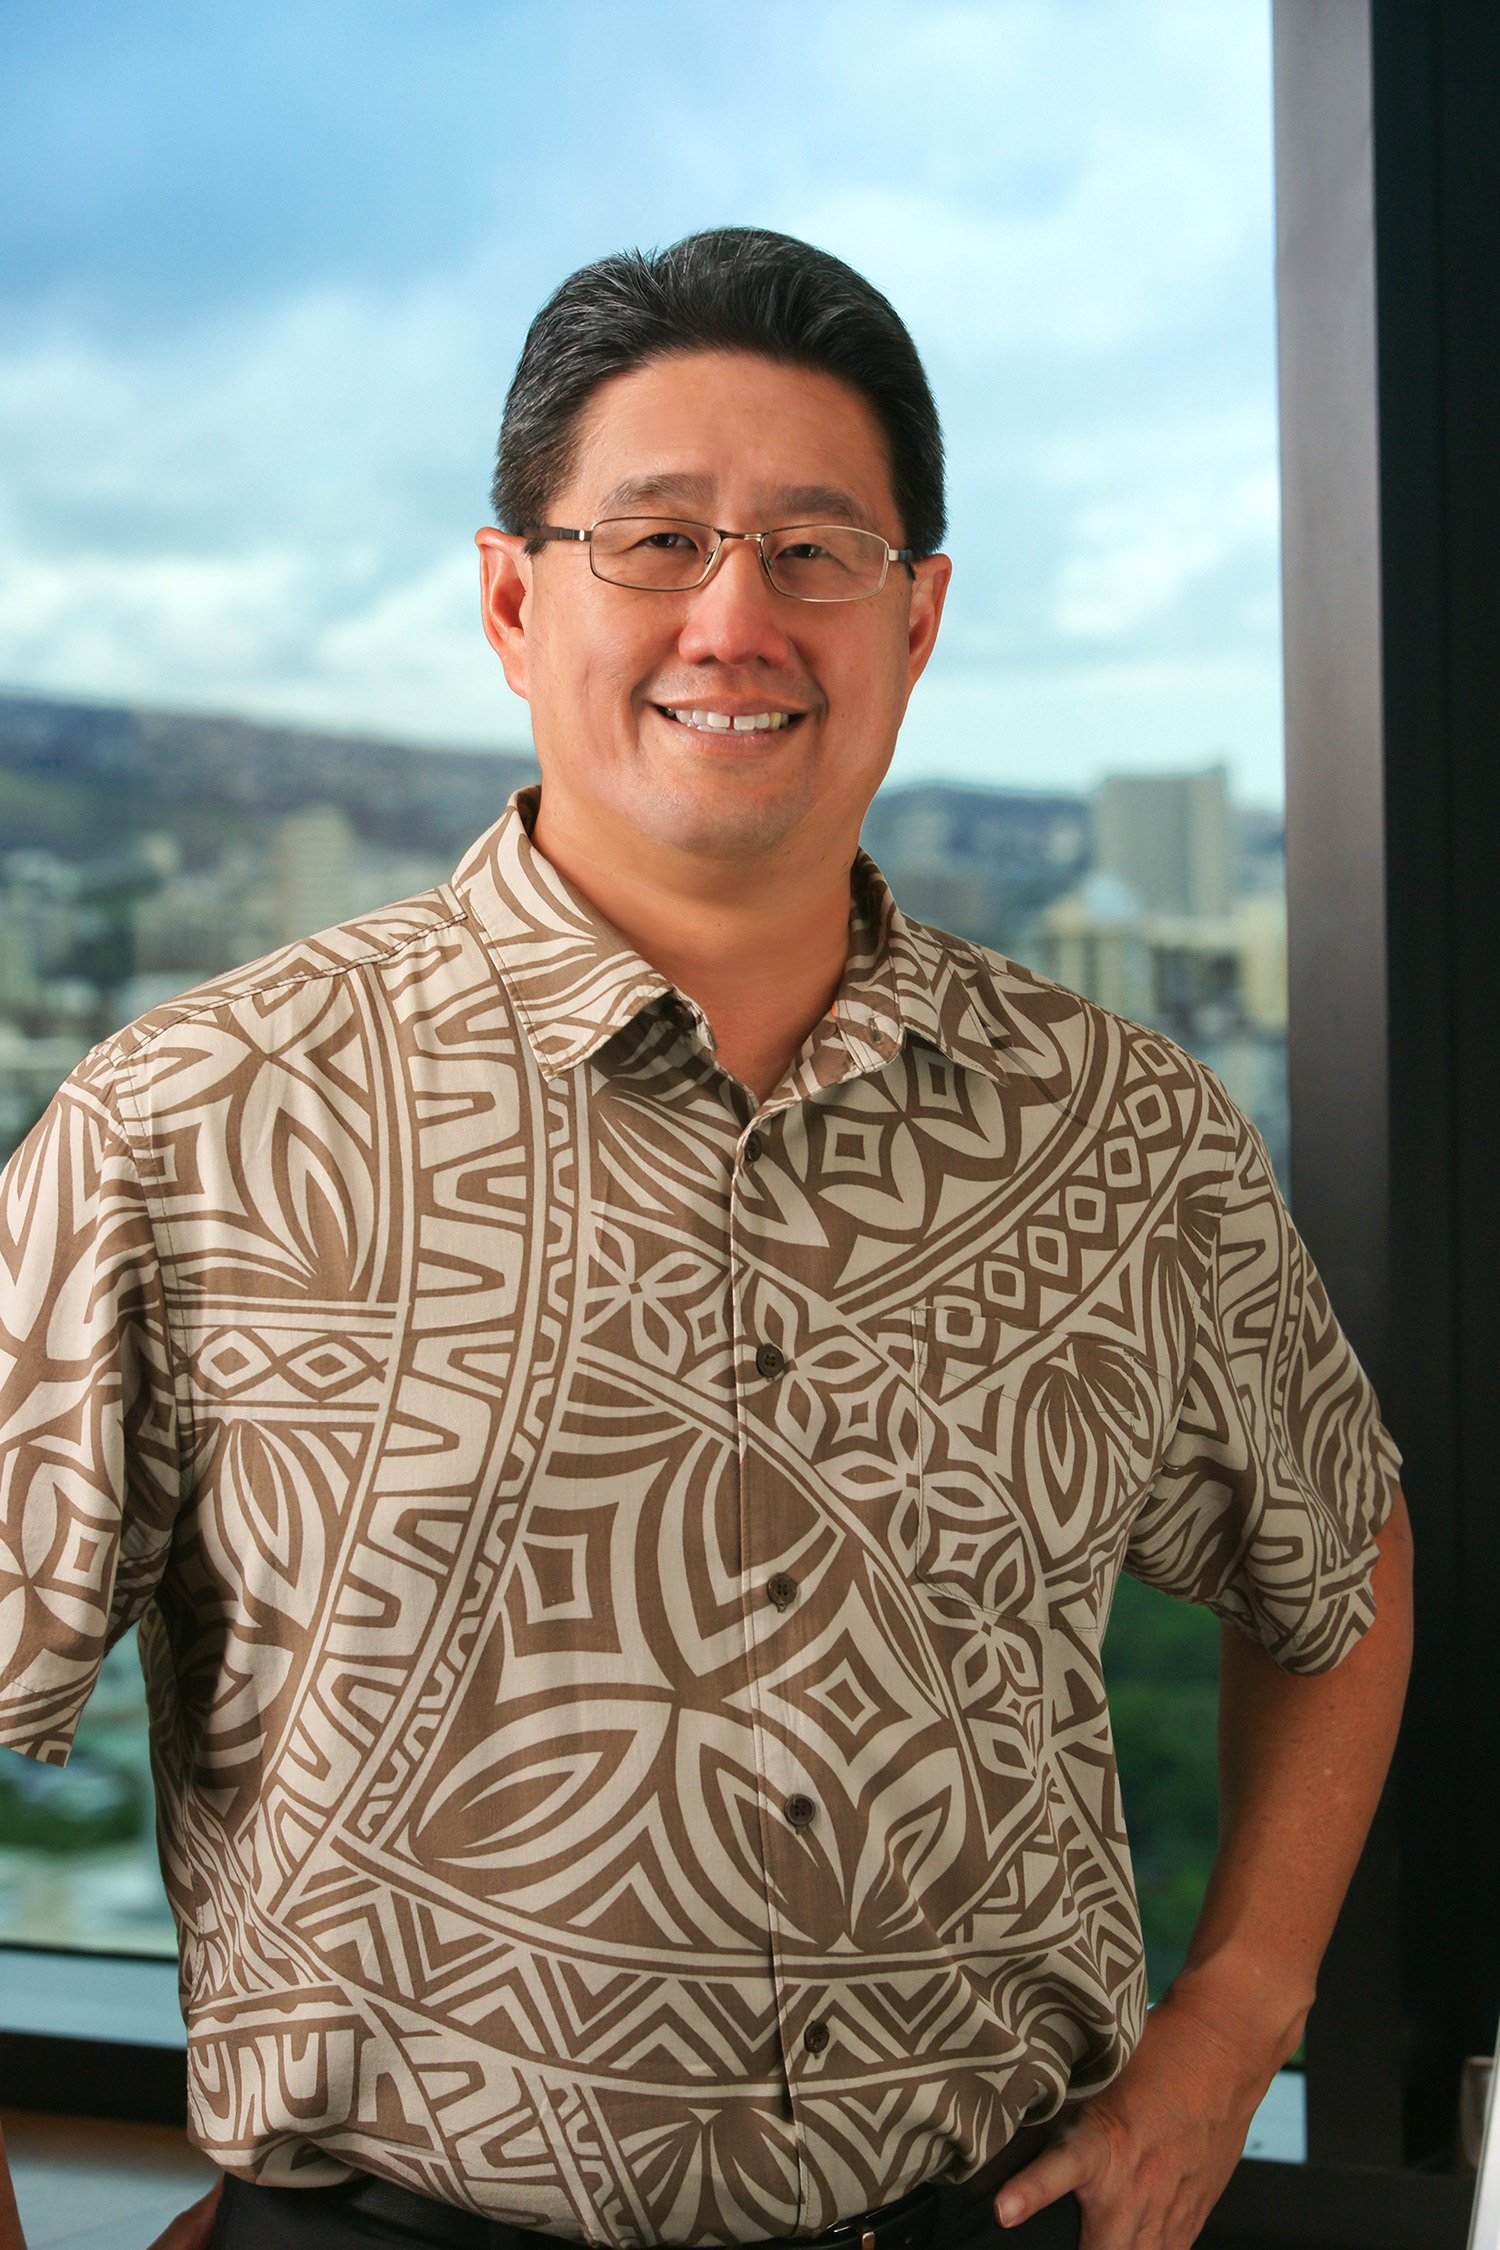 PKF_Rodney Lee-Aloha Full_reduced.jpg